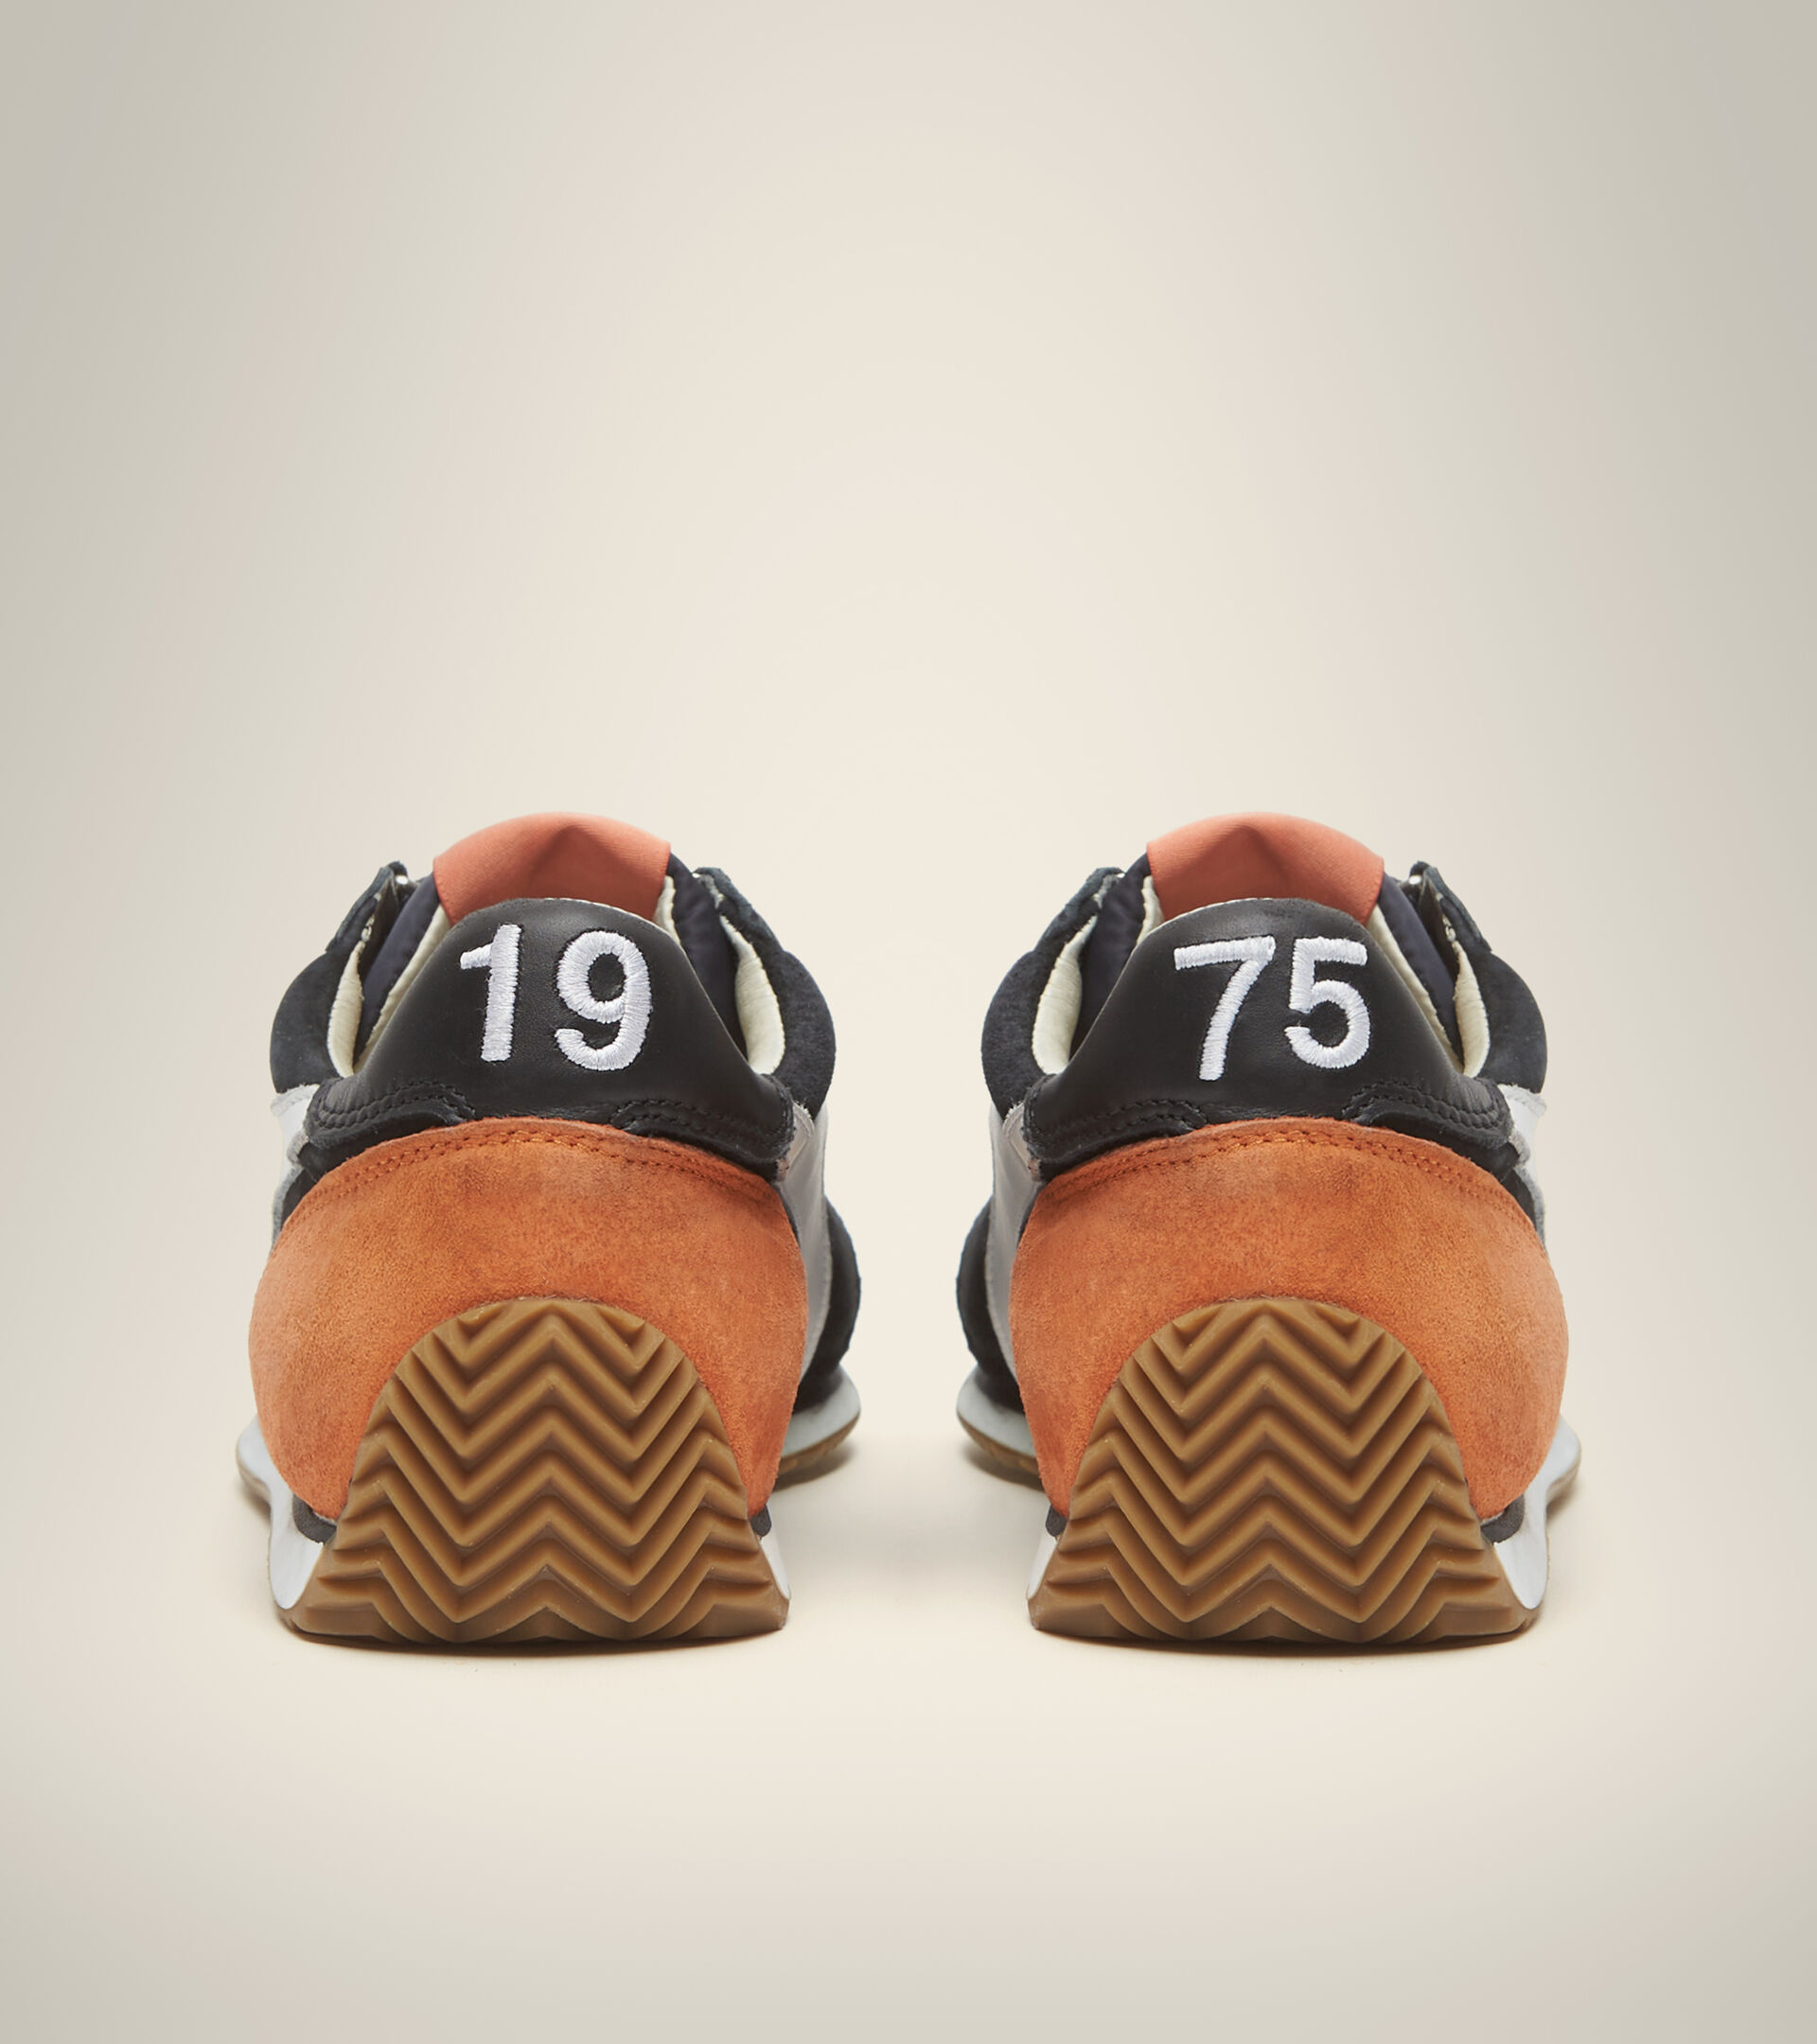 Footwear Heritage UNISEX EQUIPE SUEDE SW NERO FANTASMA Diadora